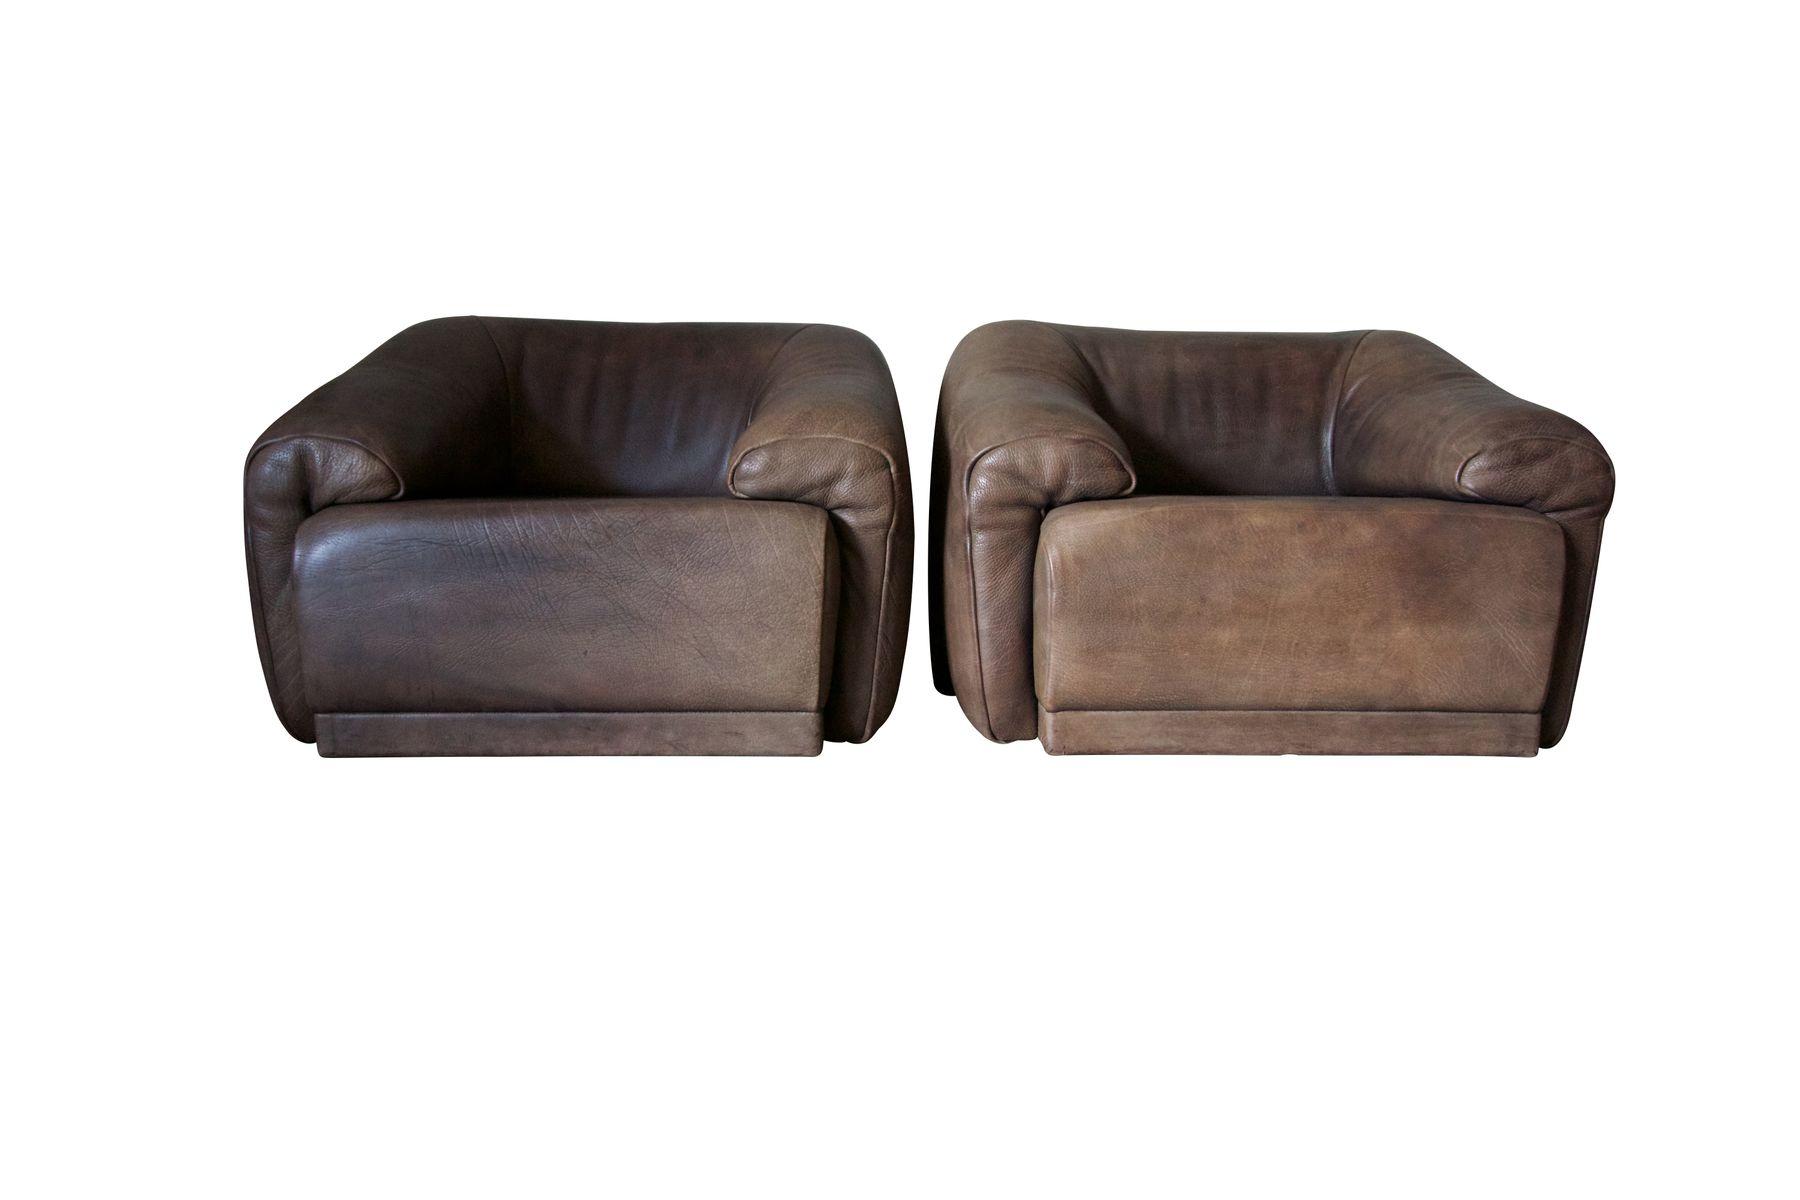 schokoladenbraune buffalo leder clubsessel mit fu hocker von de sede 1970er 2er set bei pamono. Black Bedroom Furniture Sets. Home Design Ideas